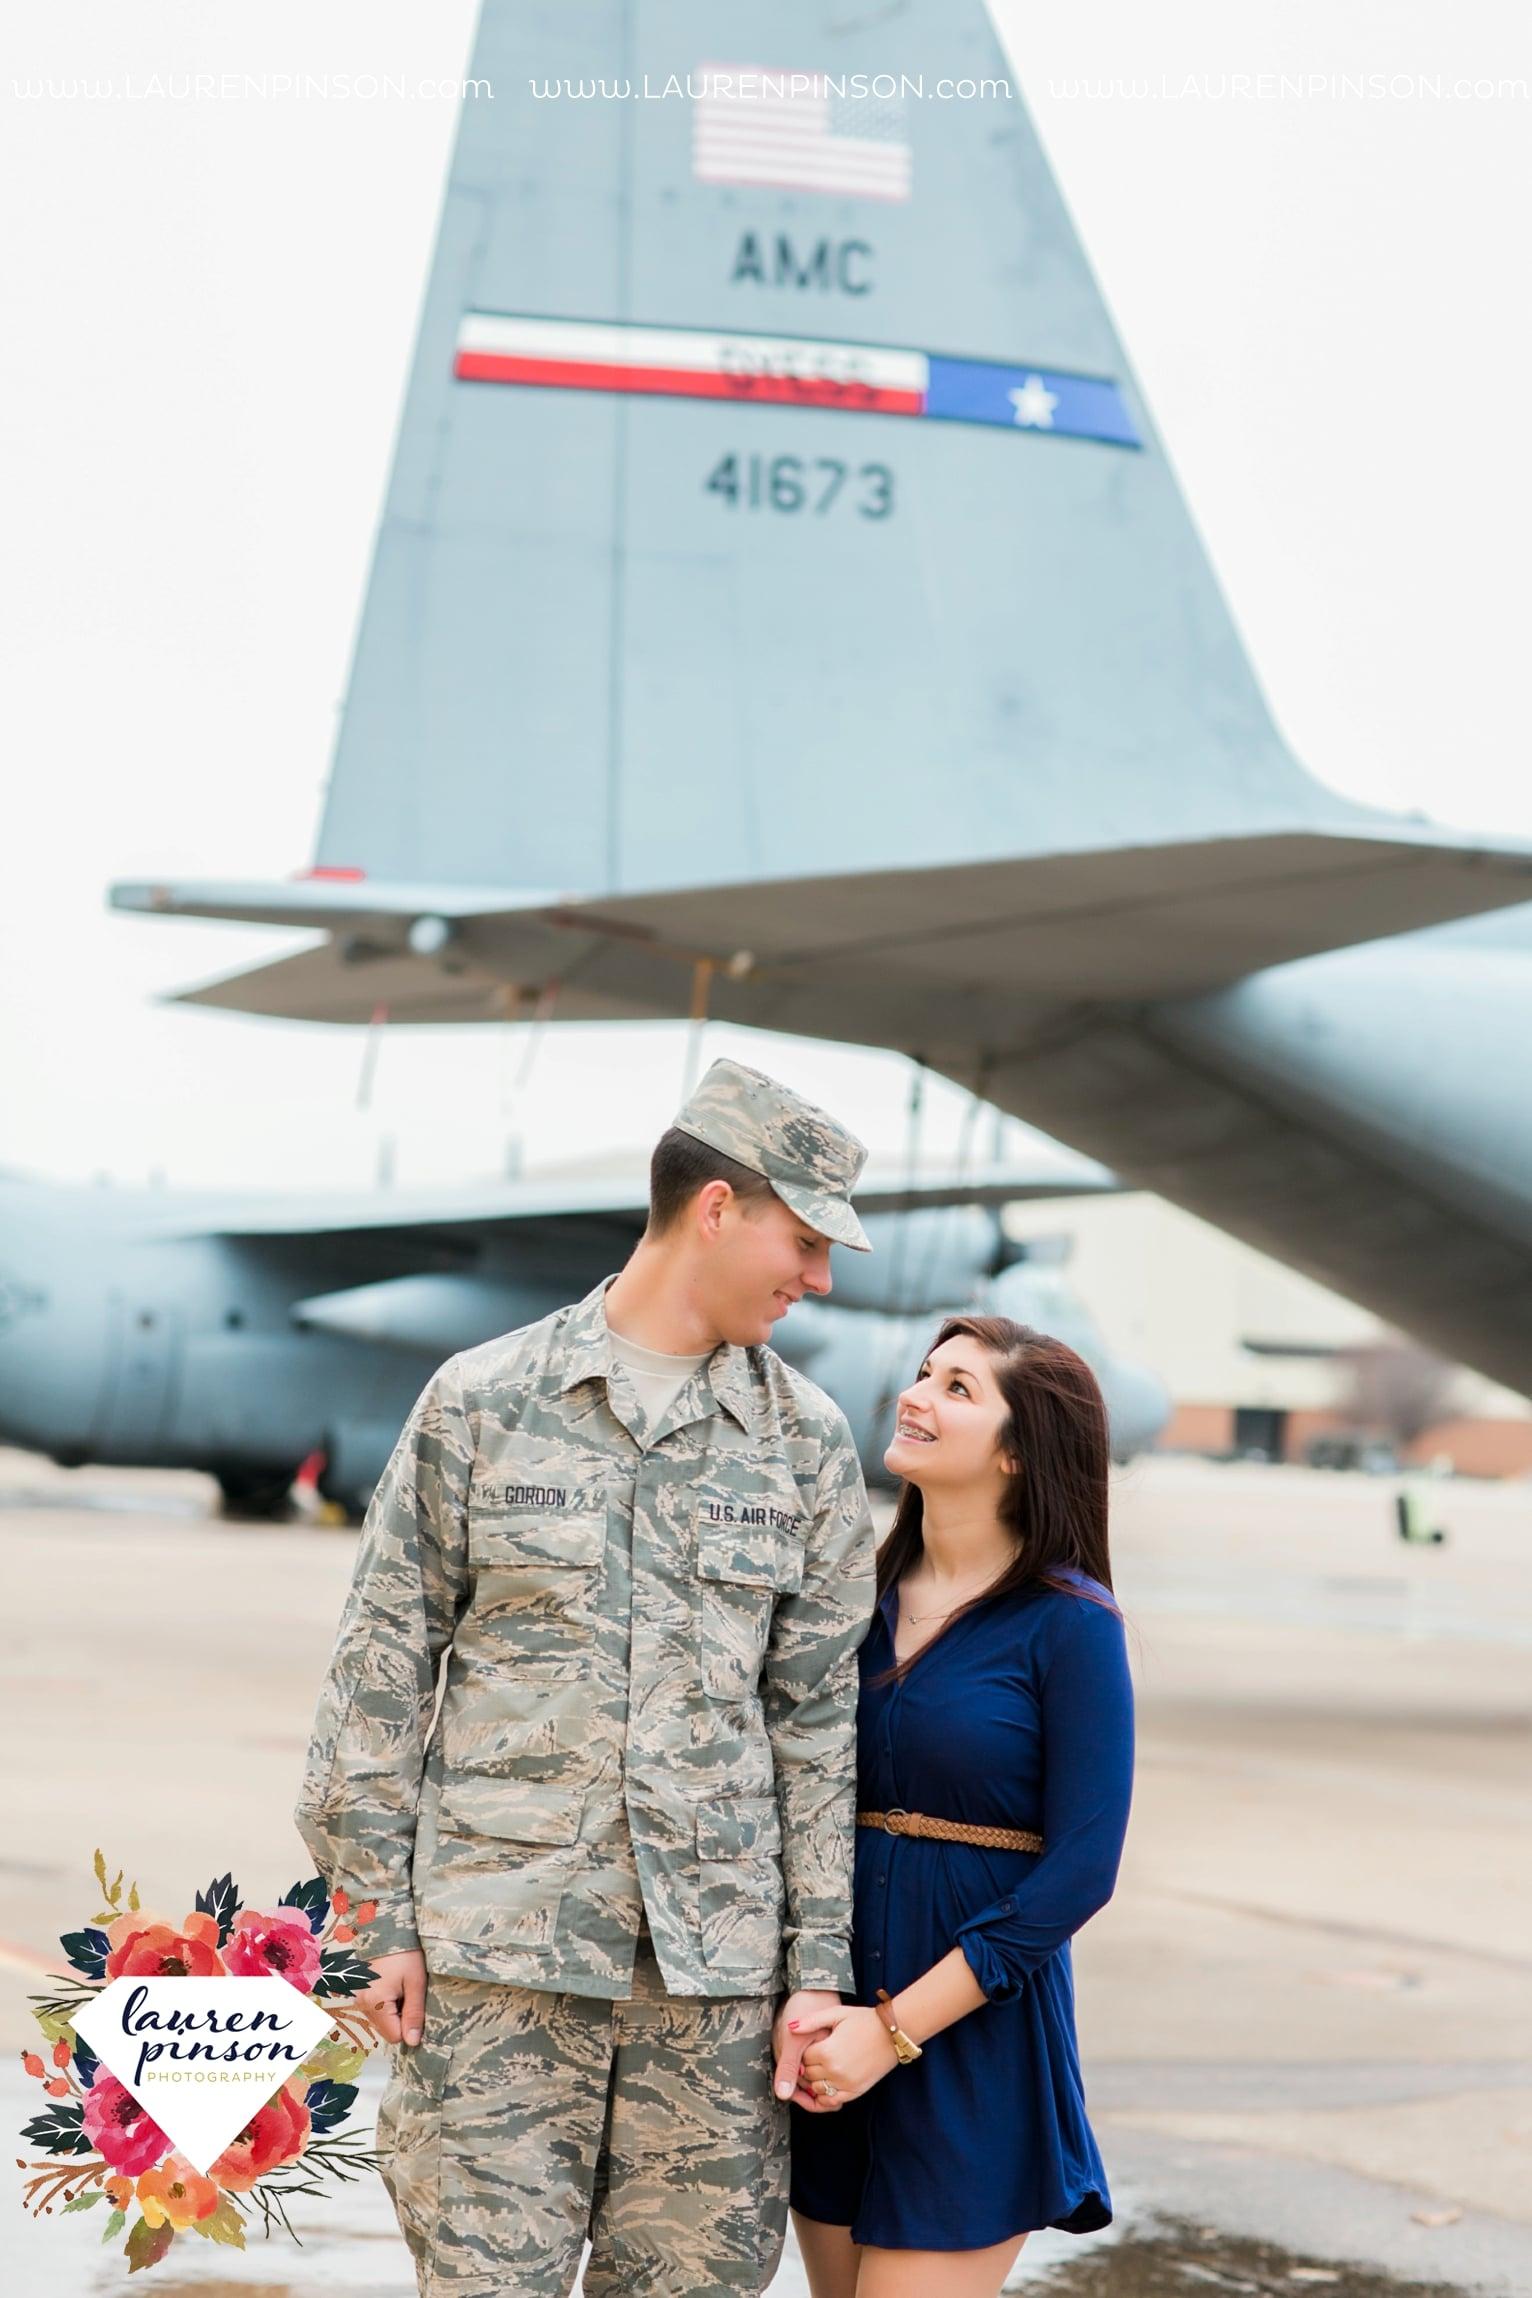 sheppard-afb-wichita-falls-engagement-session-airmen-in-uniform-abu-airplanes-bride-engagement-ring-texas-air-force-base_2002.jpg